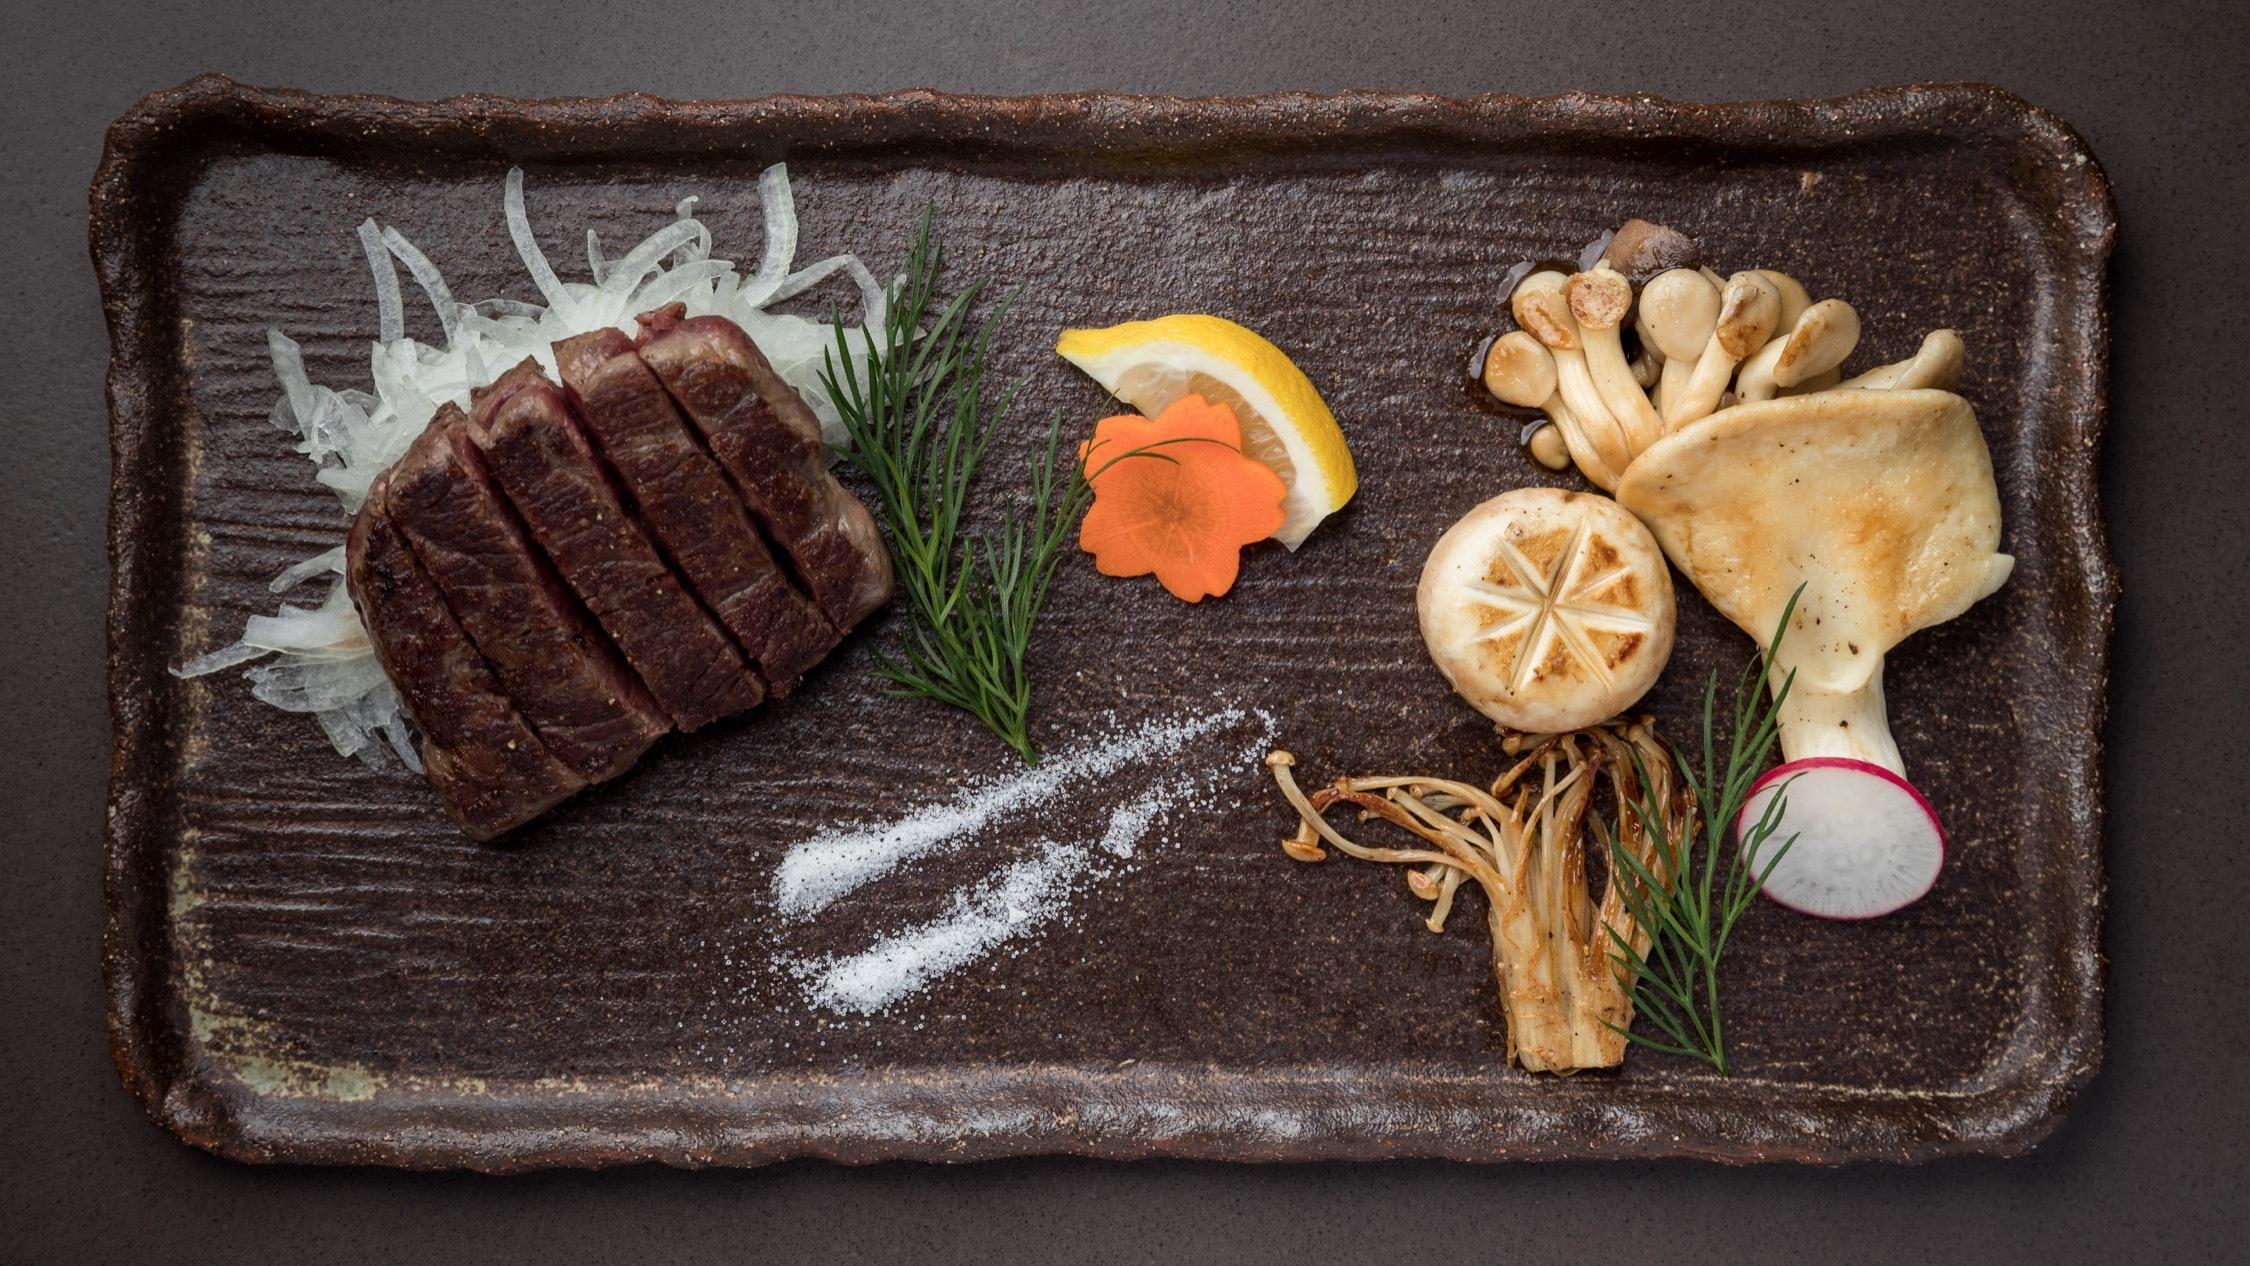 Steak and mushroom at Hana Ju-Rin